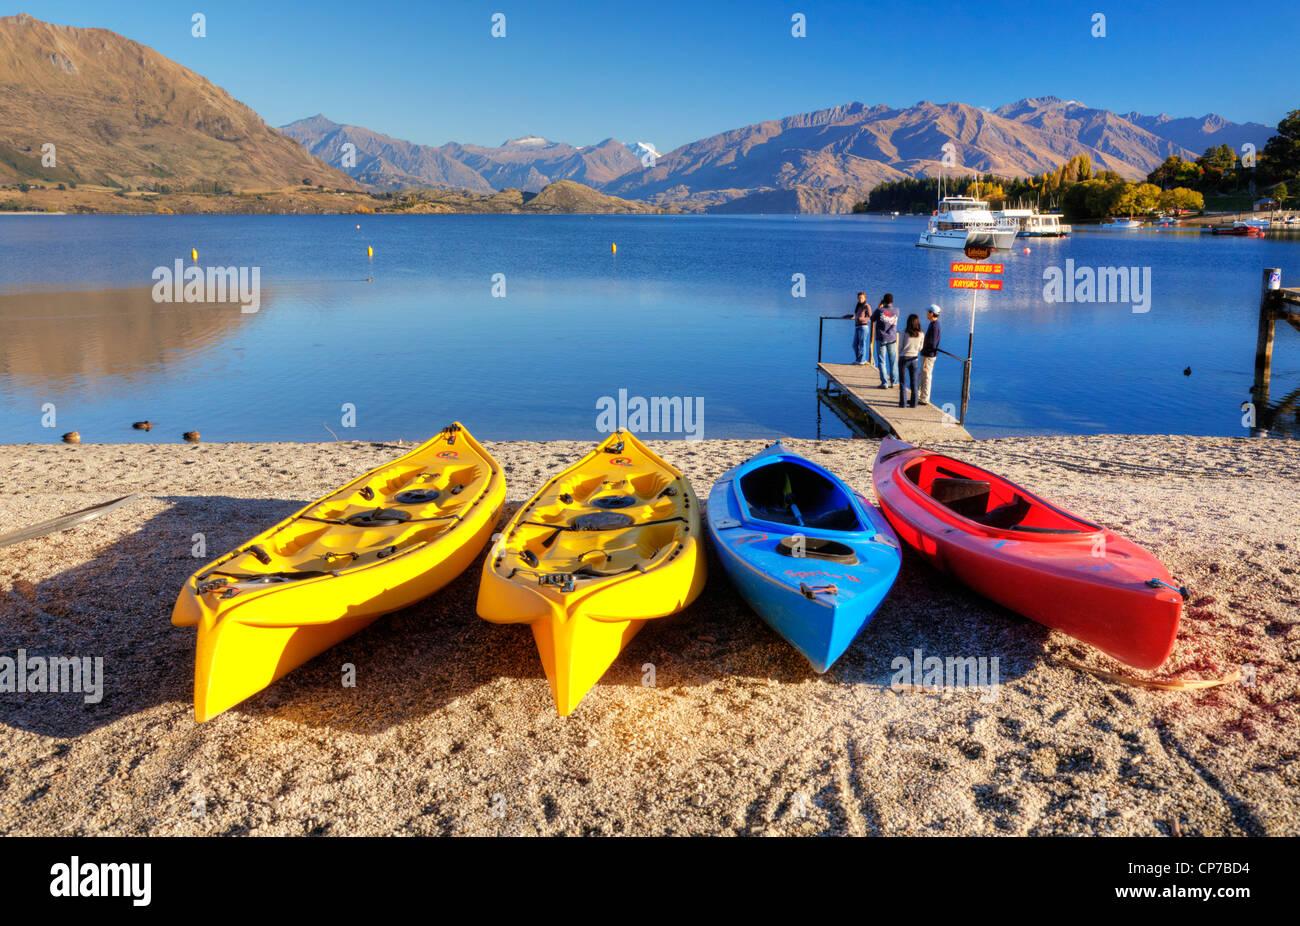 Kayaks for hire at Lake Wanaka, Otago, New Zealand. - Stock Image